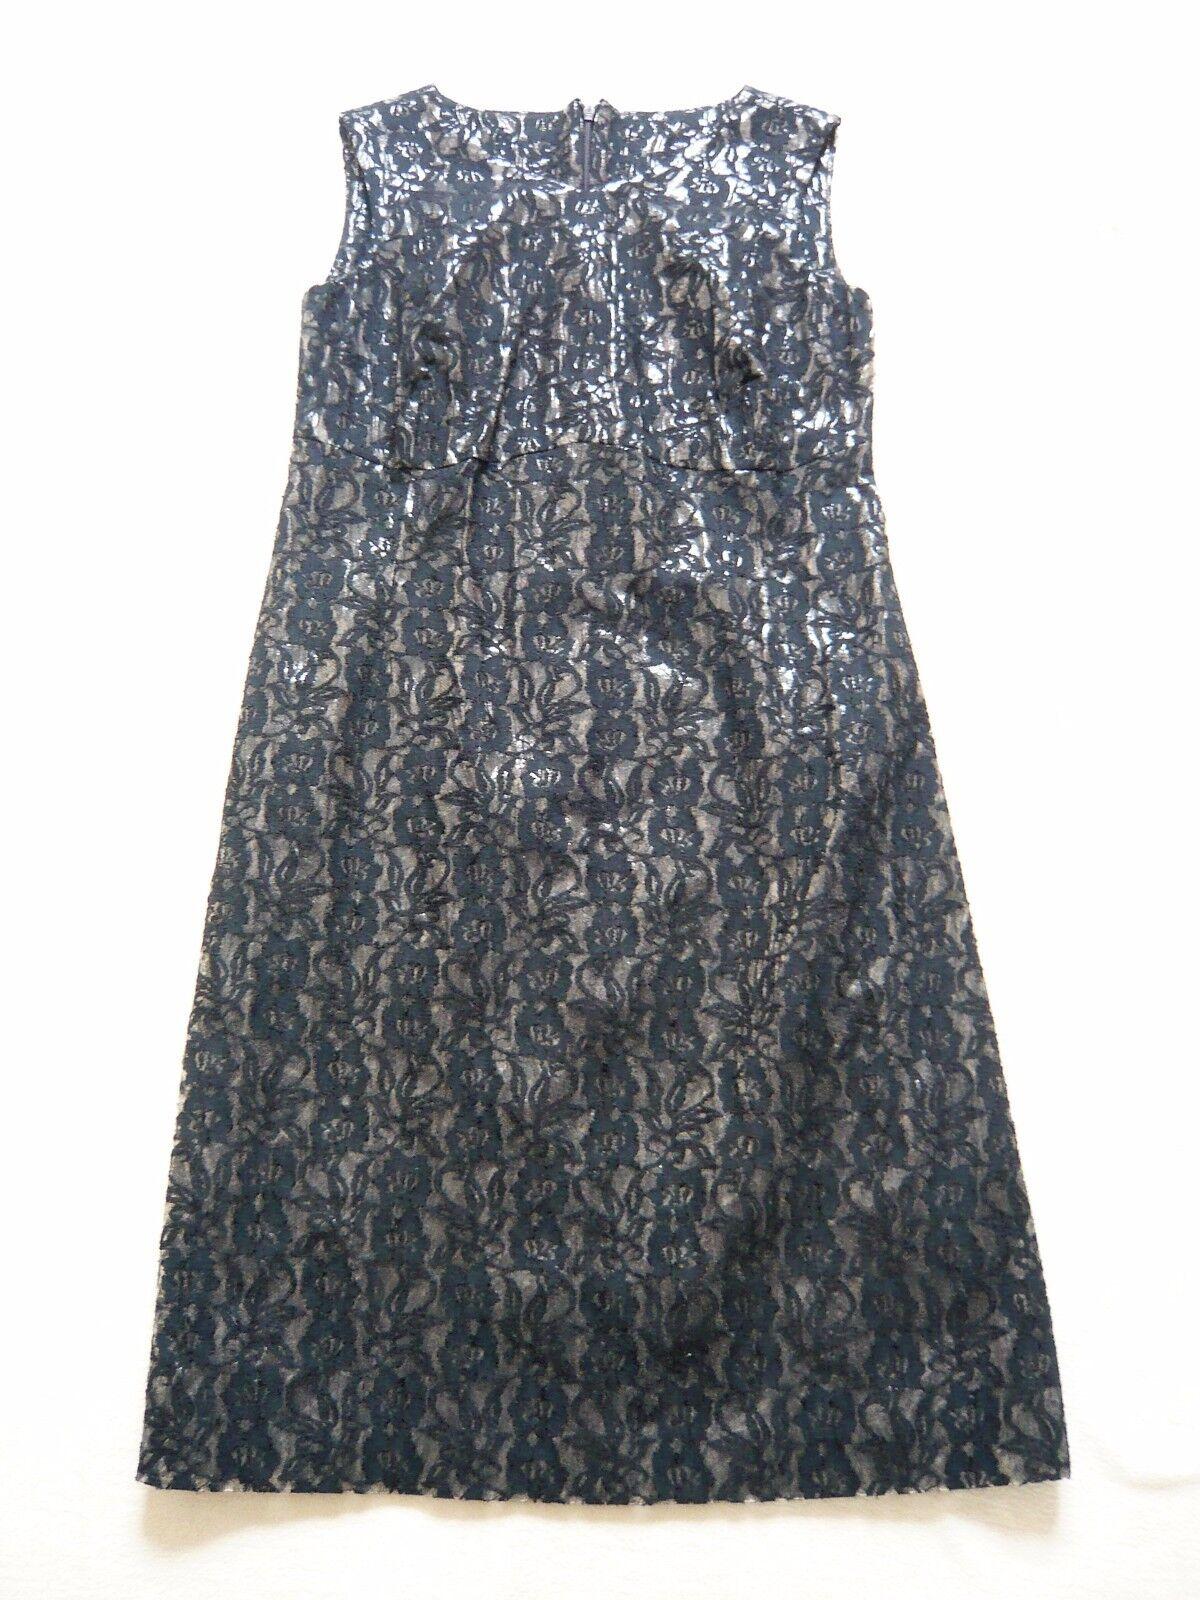 John Rocha NOUVEAU PVC Noir Dentelle Sans Manches Designer Robe Made in Ireland UK 10